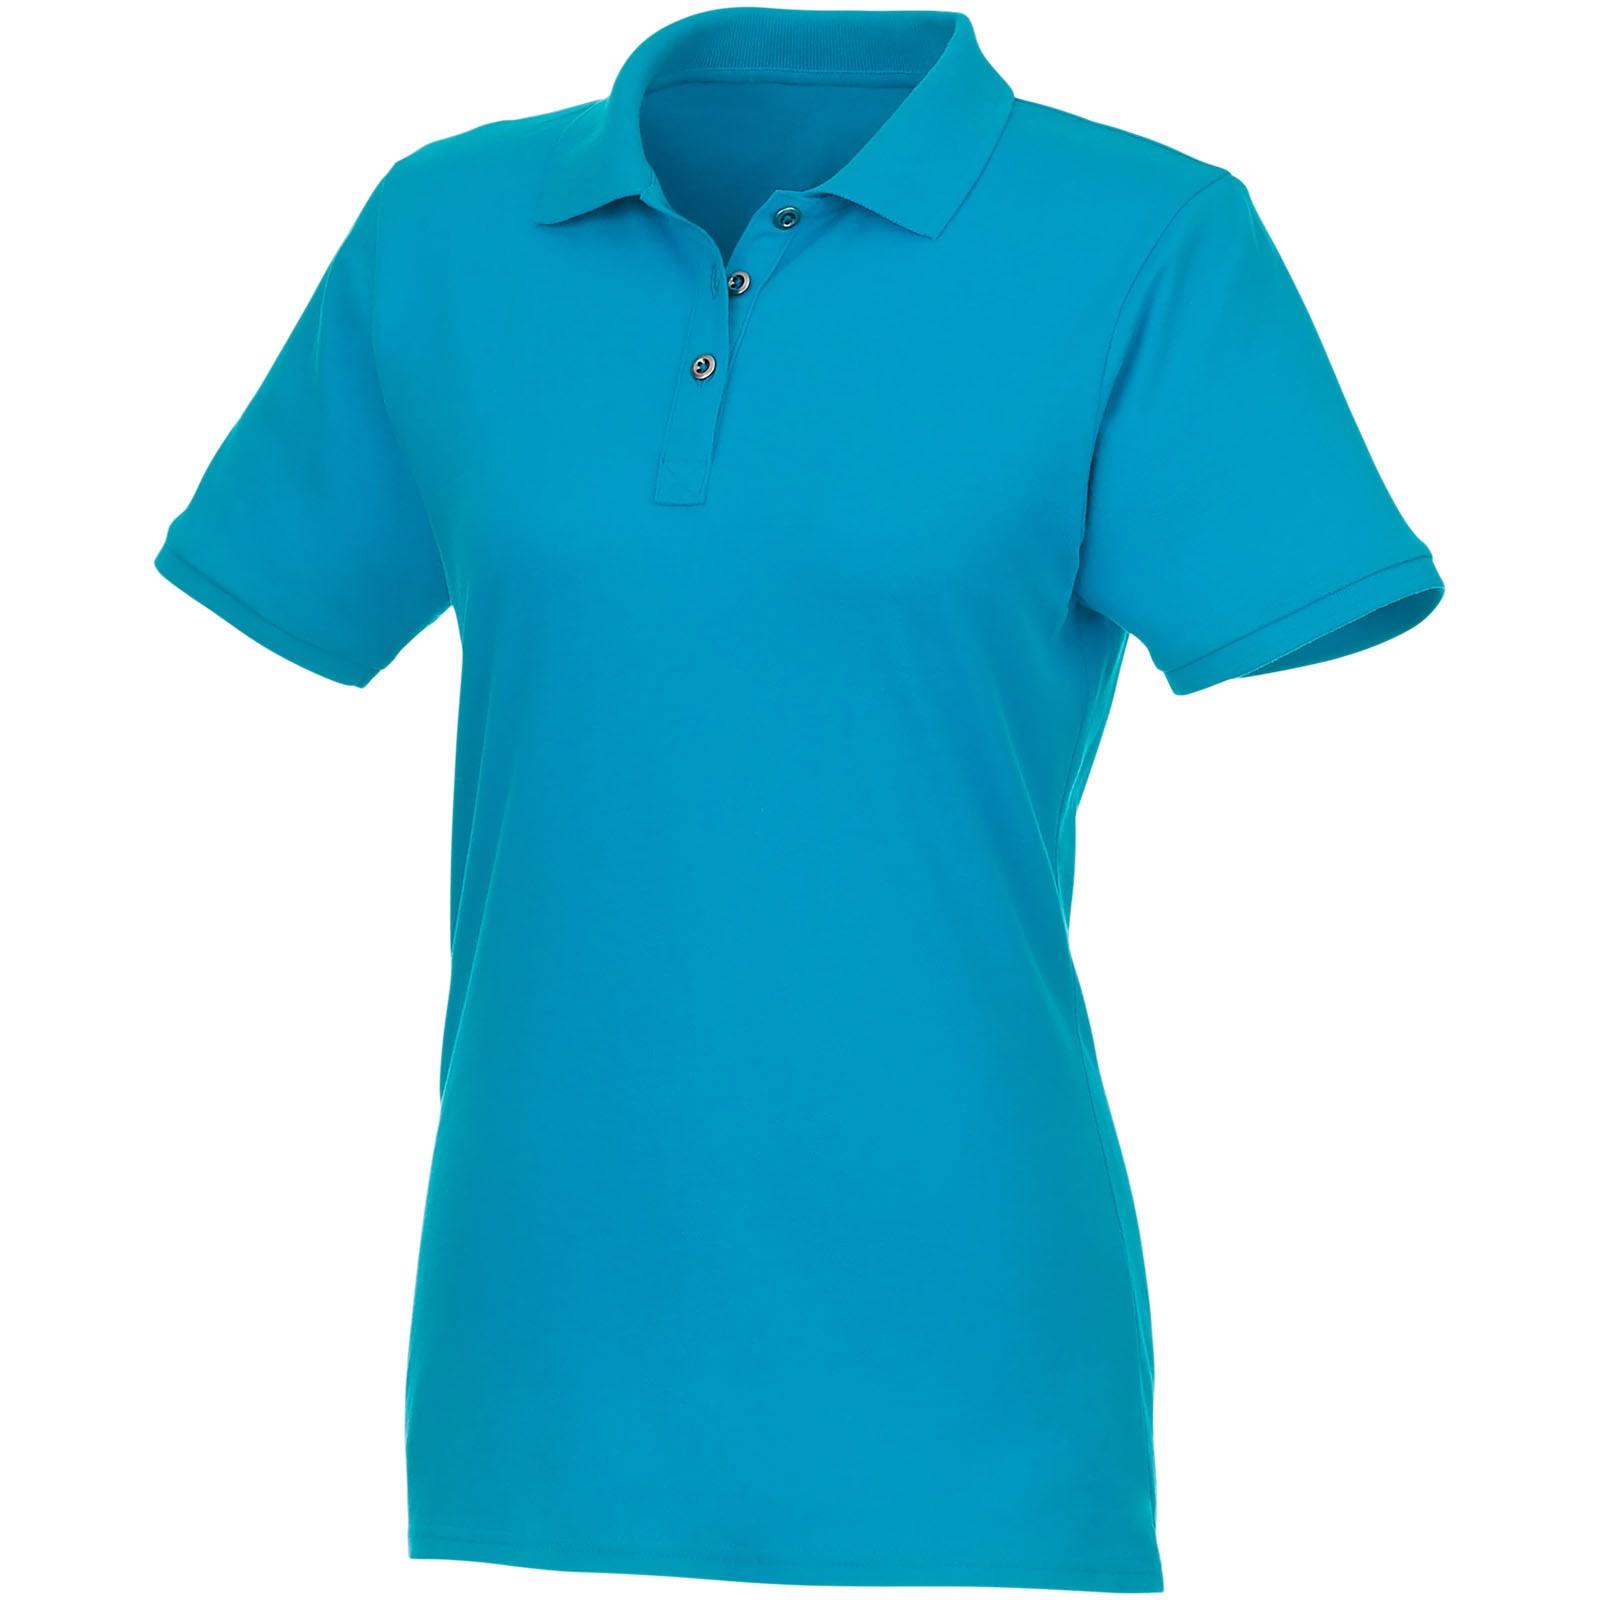 Beryl short sleeve women's GOTS organic GRS recycled polo - Nxt Blue / S